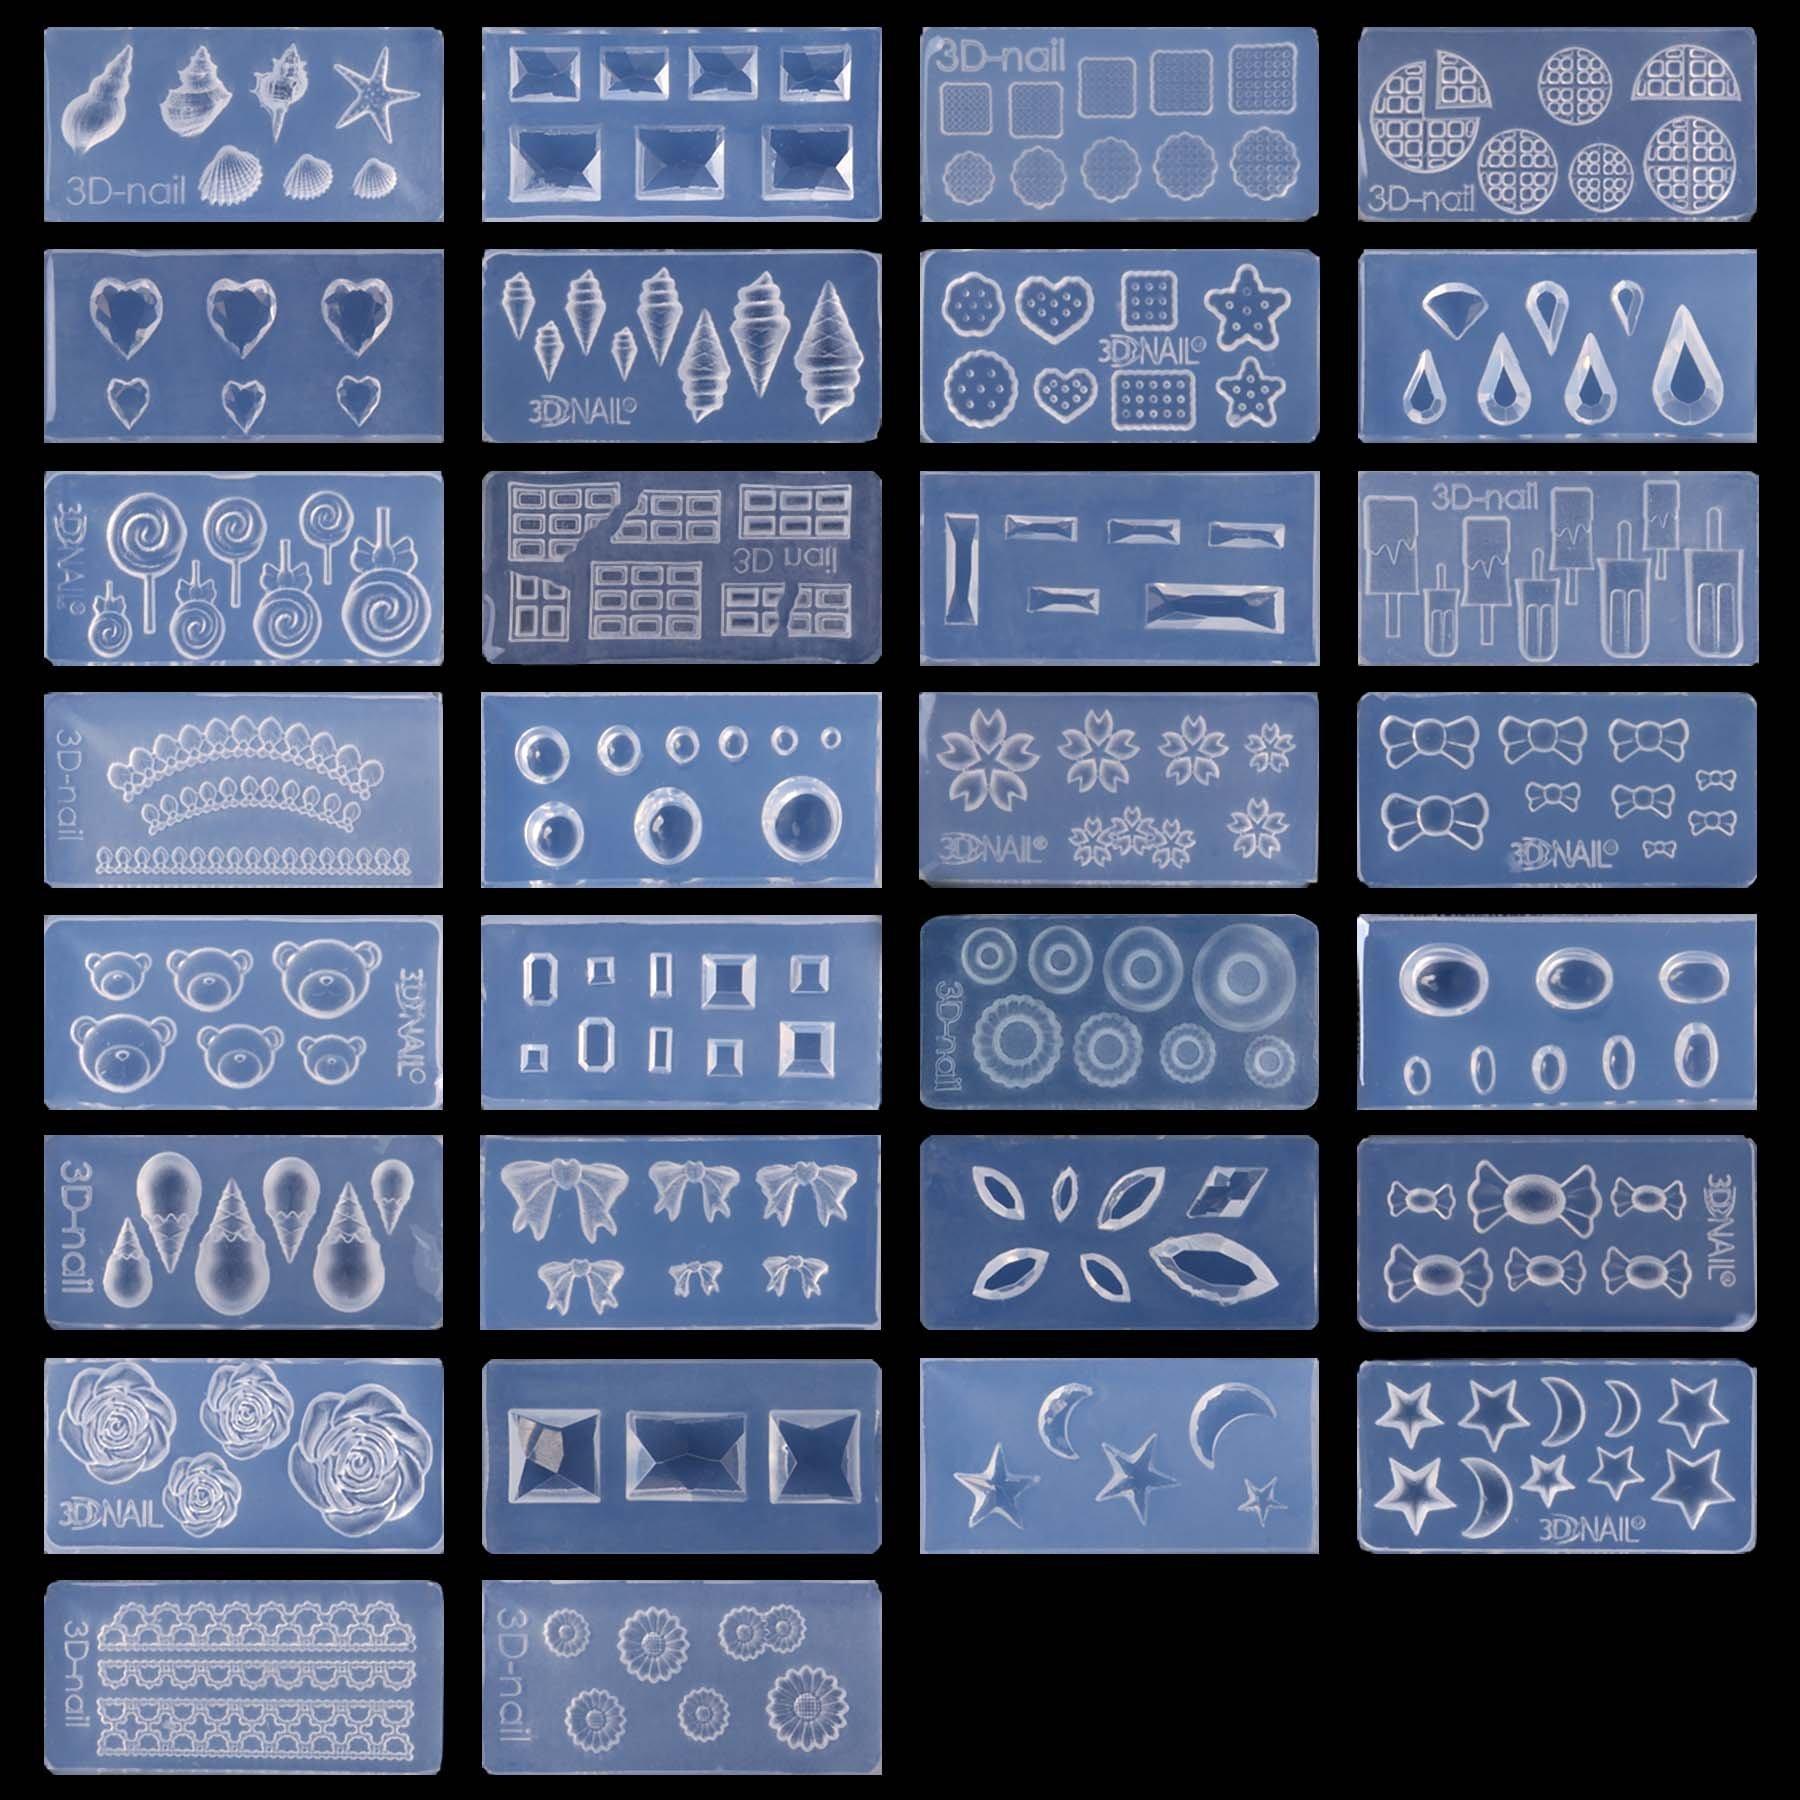 Amazon.com : 30pcs New Cute 3D Acrylic Mold Kit for Nail Art DIY ...